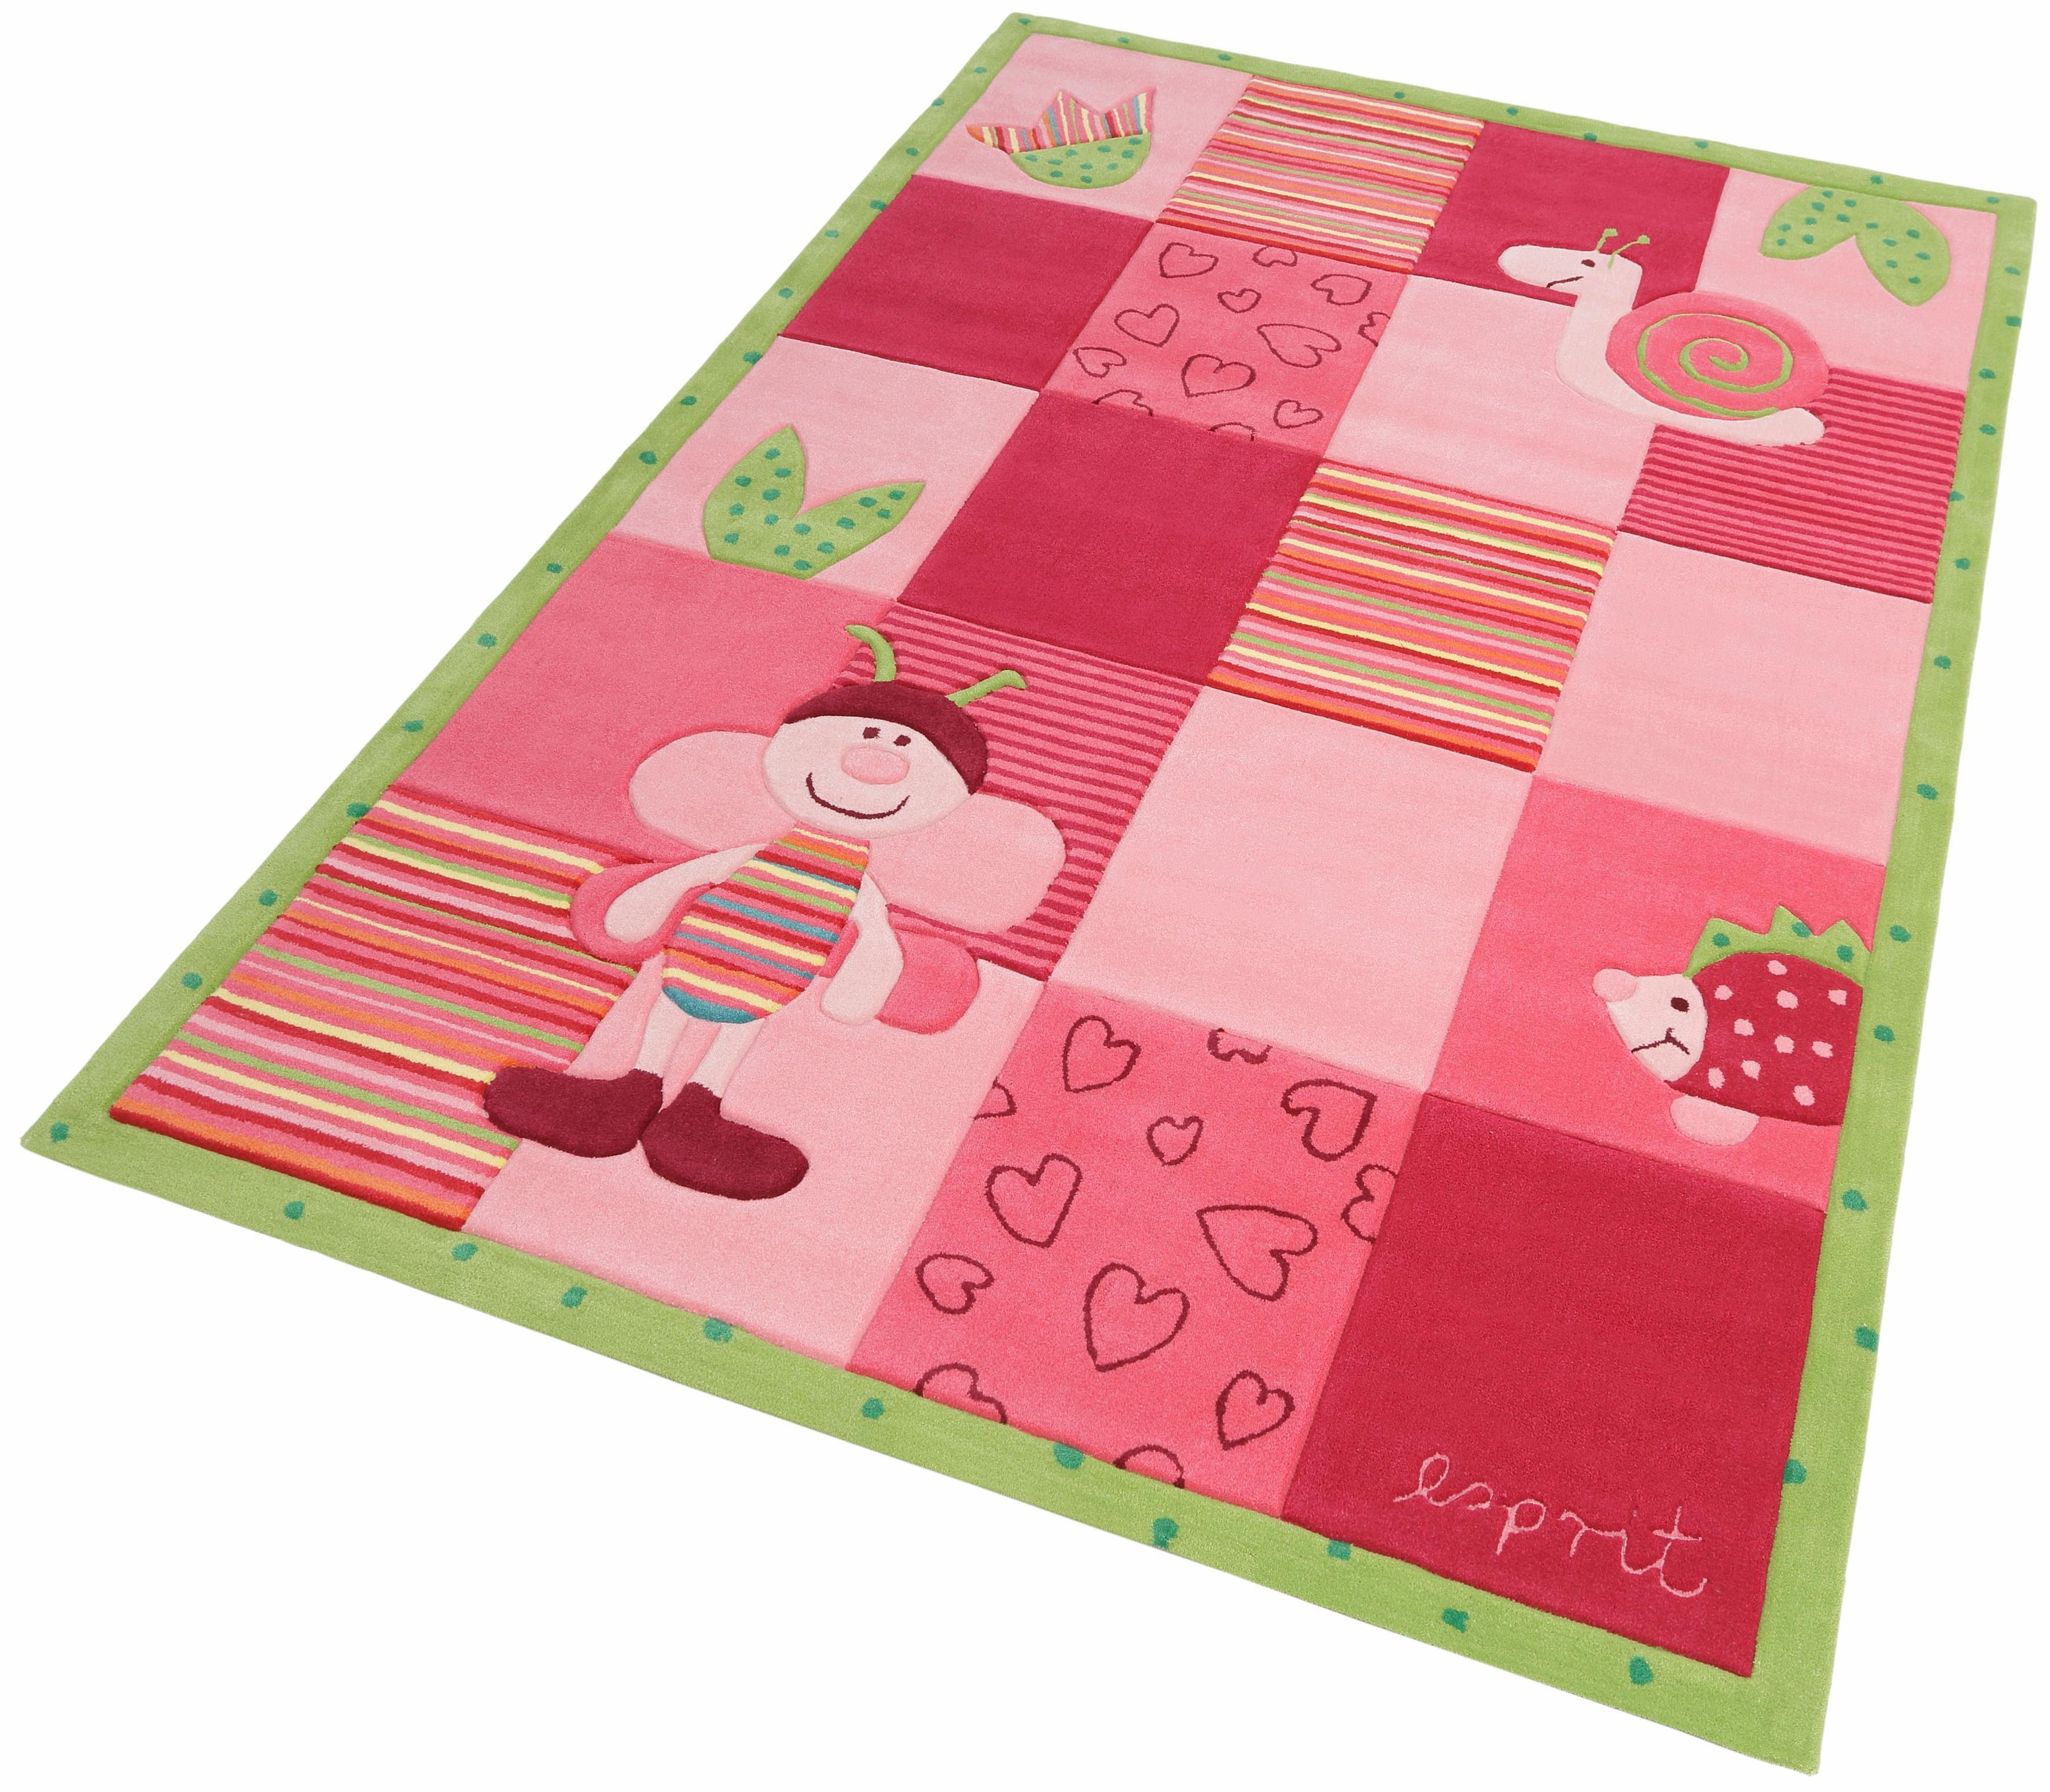 Esprit Kinderteppich Bee, rechteckig, 10 mm Höhe rosa Kinder Kinderteppiche mit Motiv Teppiche